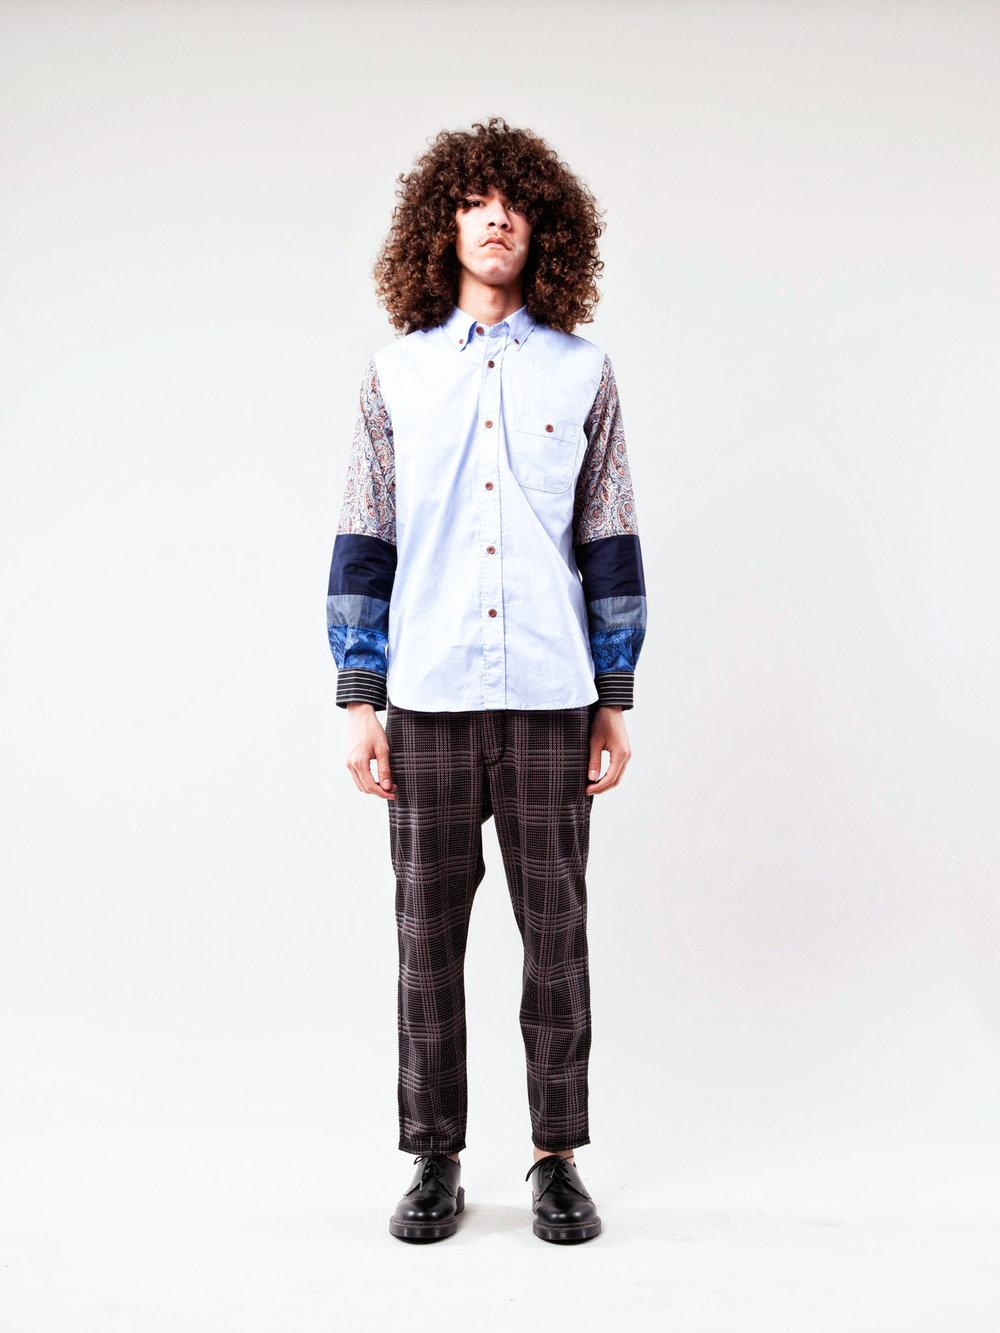 JUNYA_WATANABE_Mixed_Pattern_Sleeve_Oxford_Shirt_482c4afb-6a89-4065-ae7b-ea8ba4f9a380.jpg